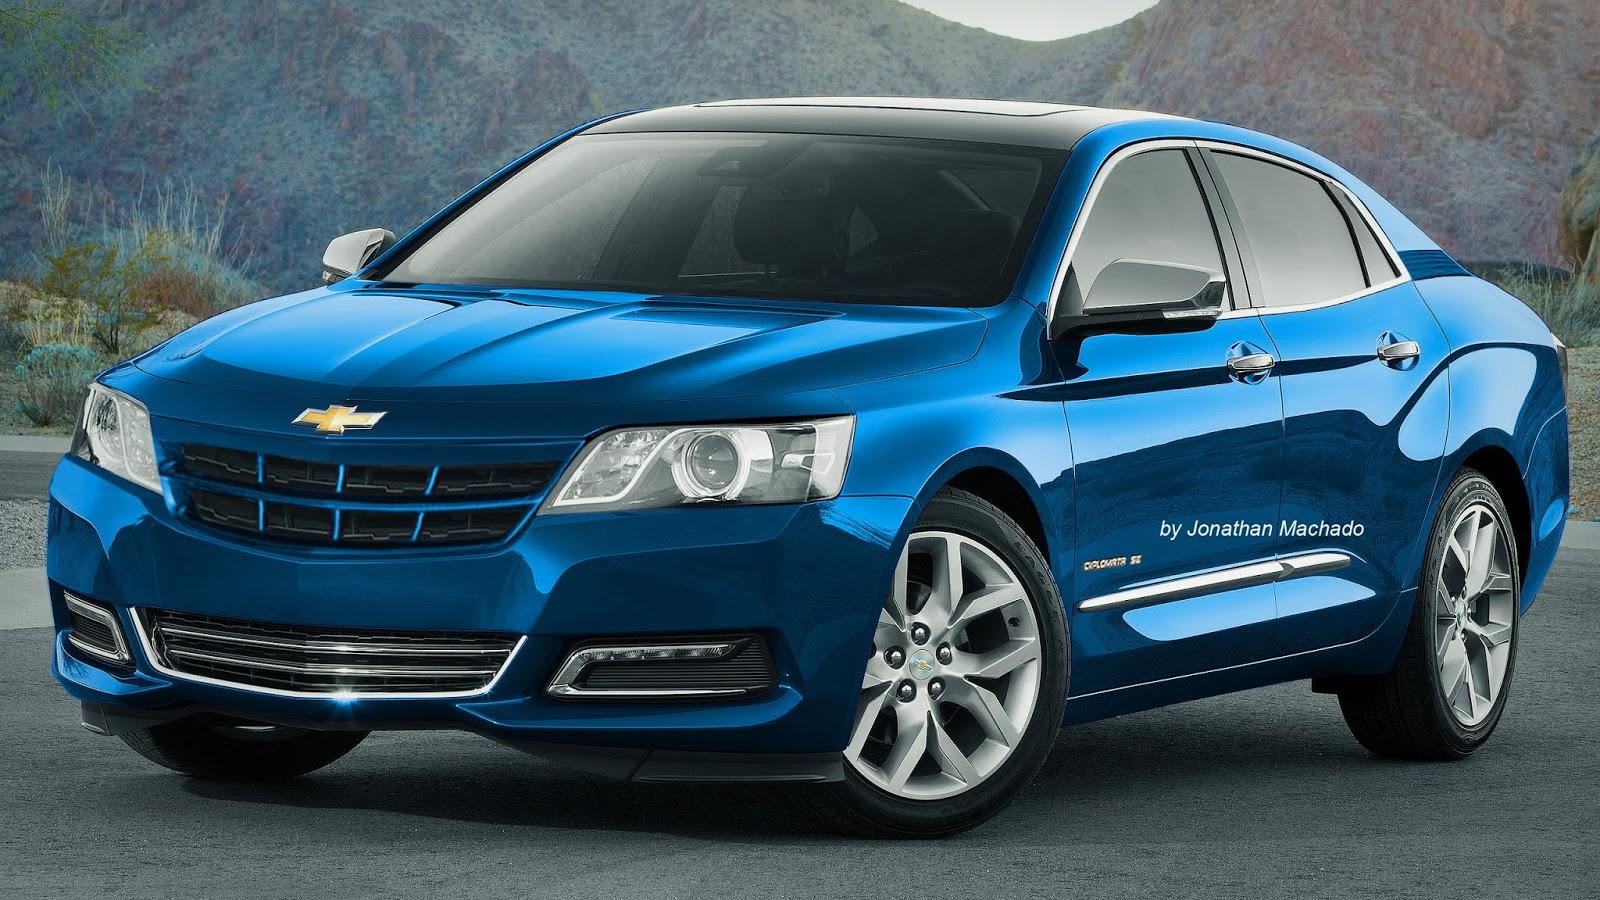 PHOTOSHOP Nova Chevrolet Opala Caravan SS AT6 3.6 Vortec V6 309 cv 36,5 kgfm #OPALA | CARWP